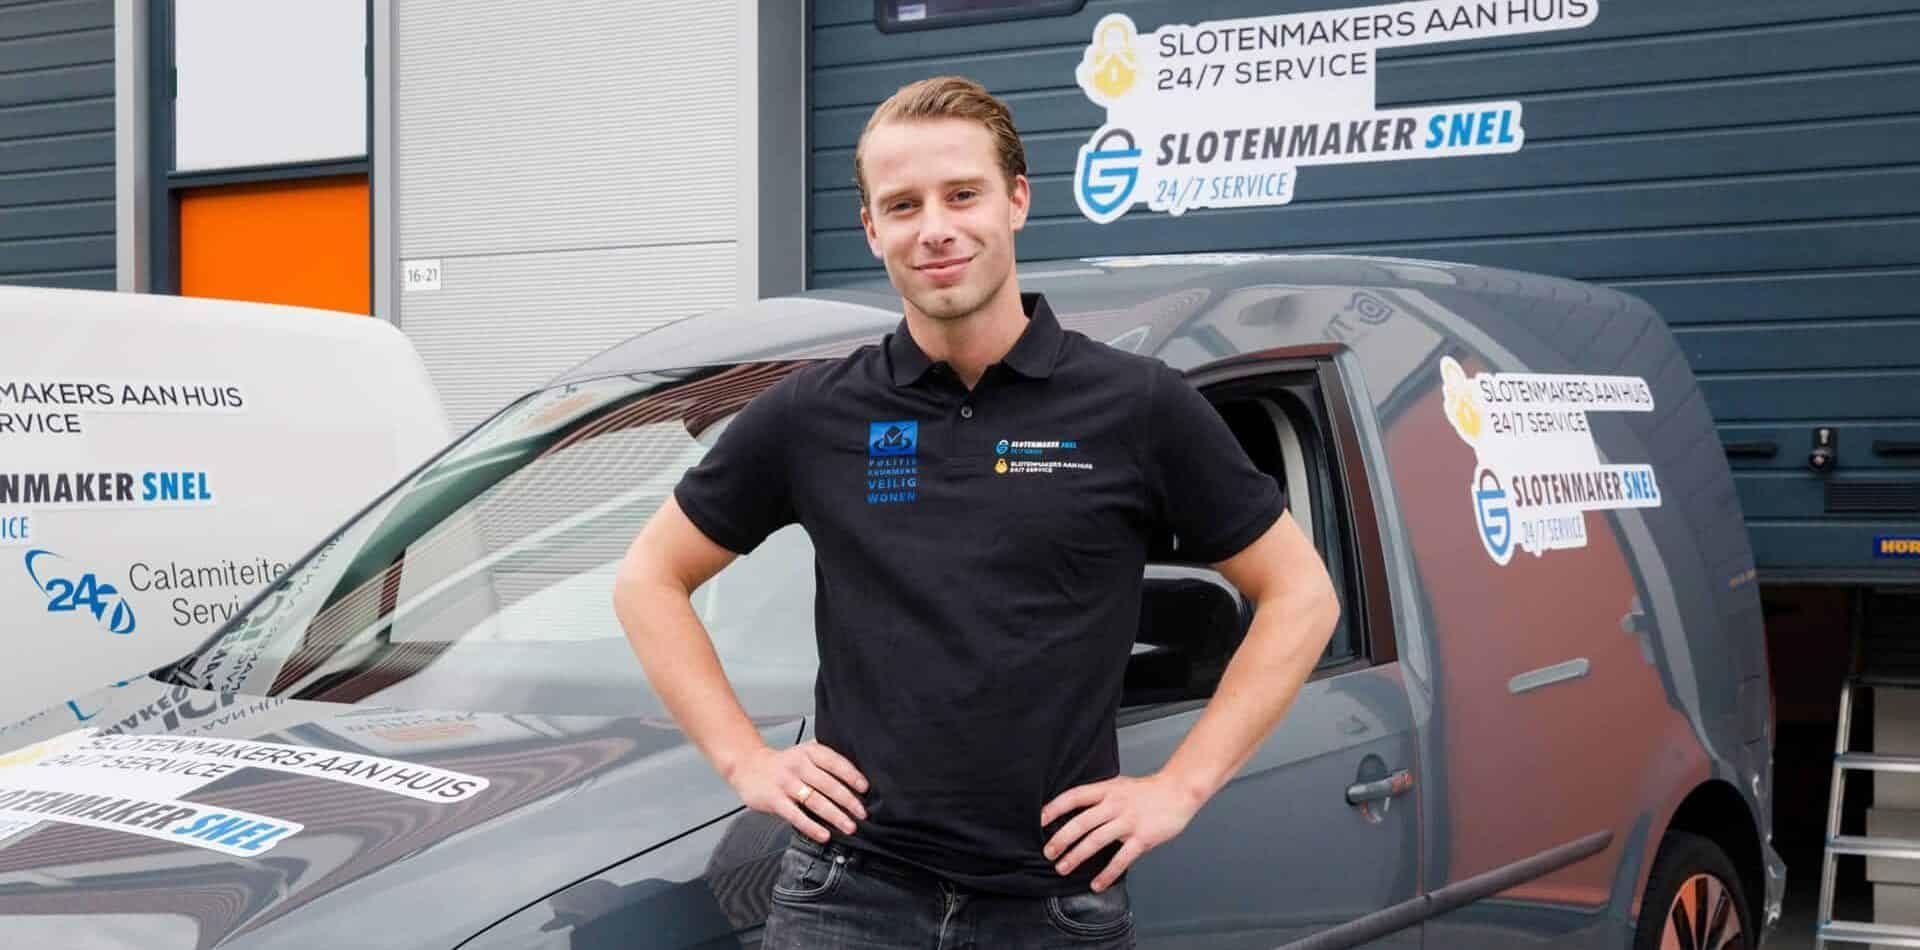 Slotenmaker Rijnsburg (6)